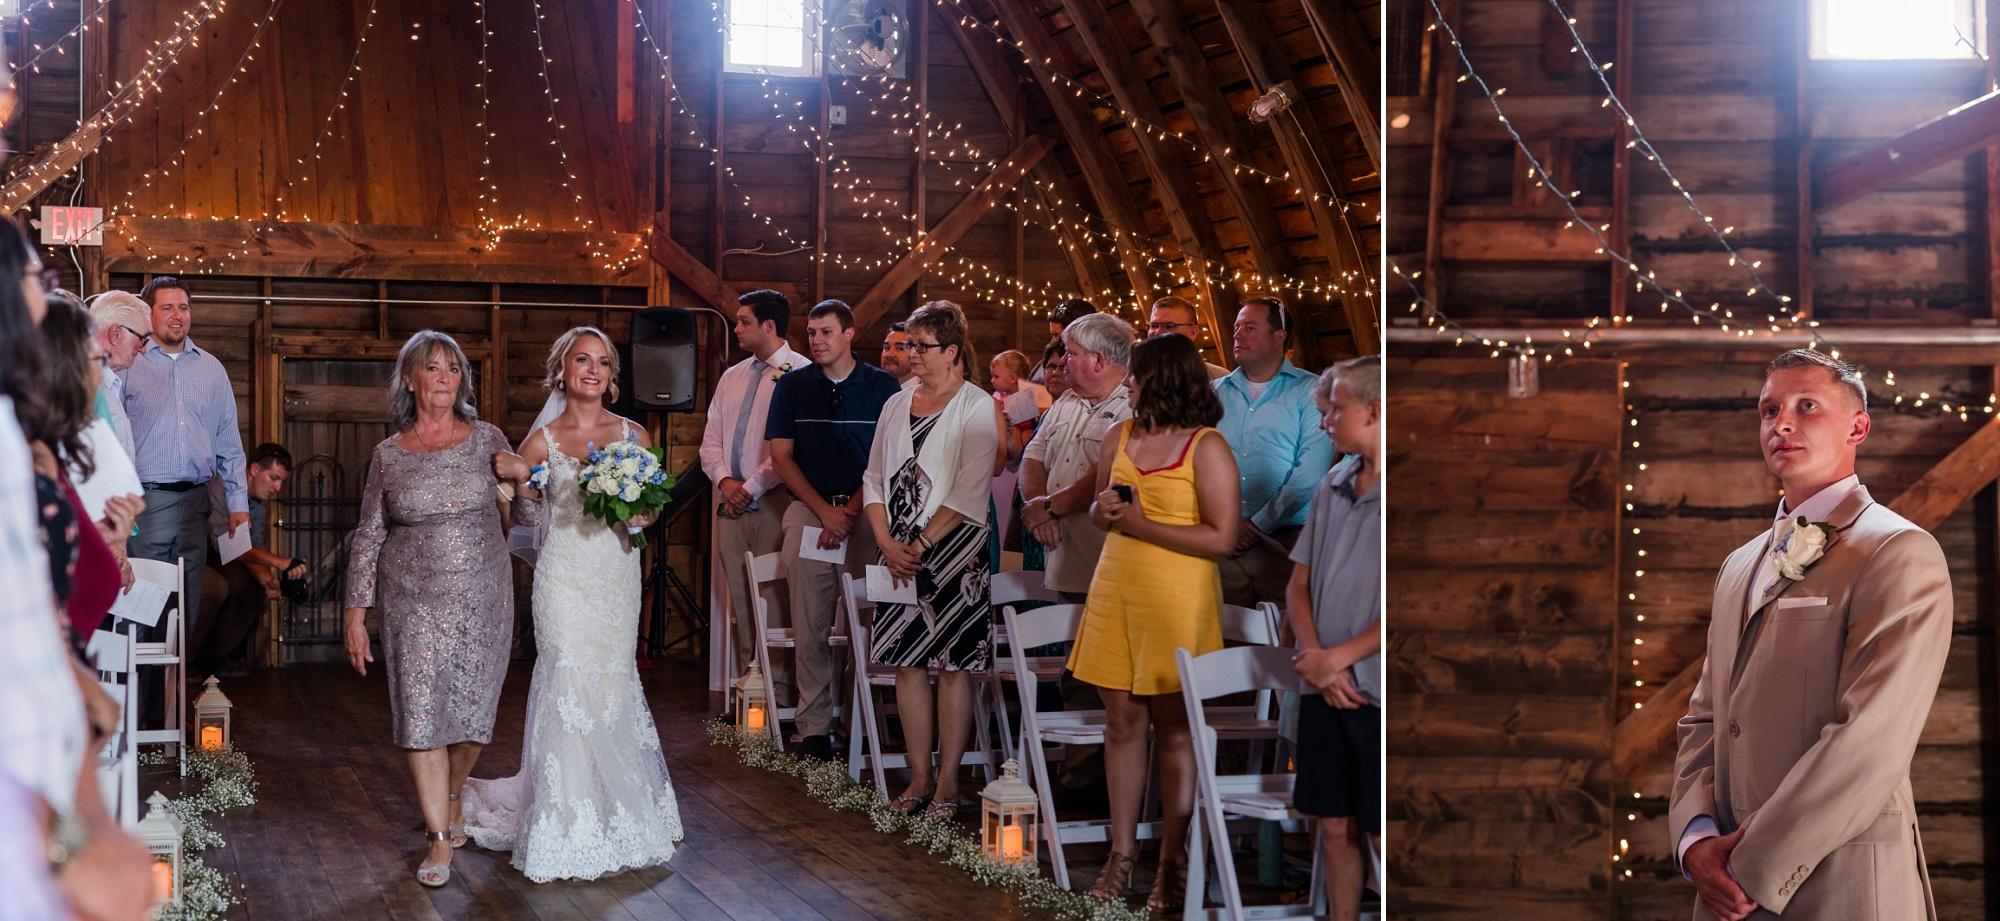 Amber Langerud Photography_Vintage Garden Minnesota Barn Wedding_5365.jpg